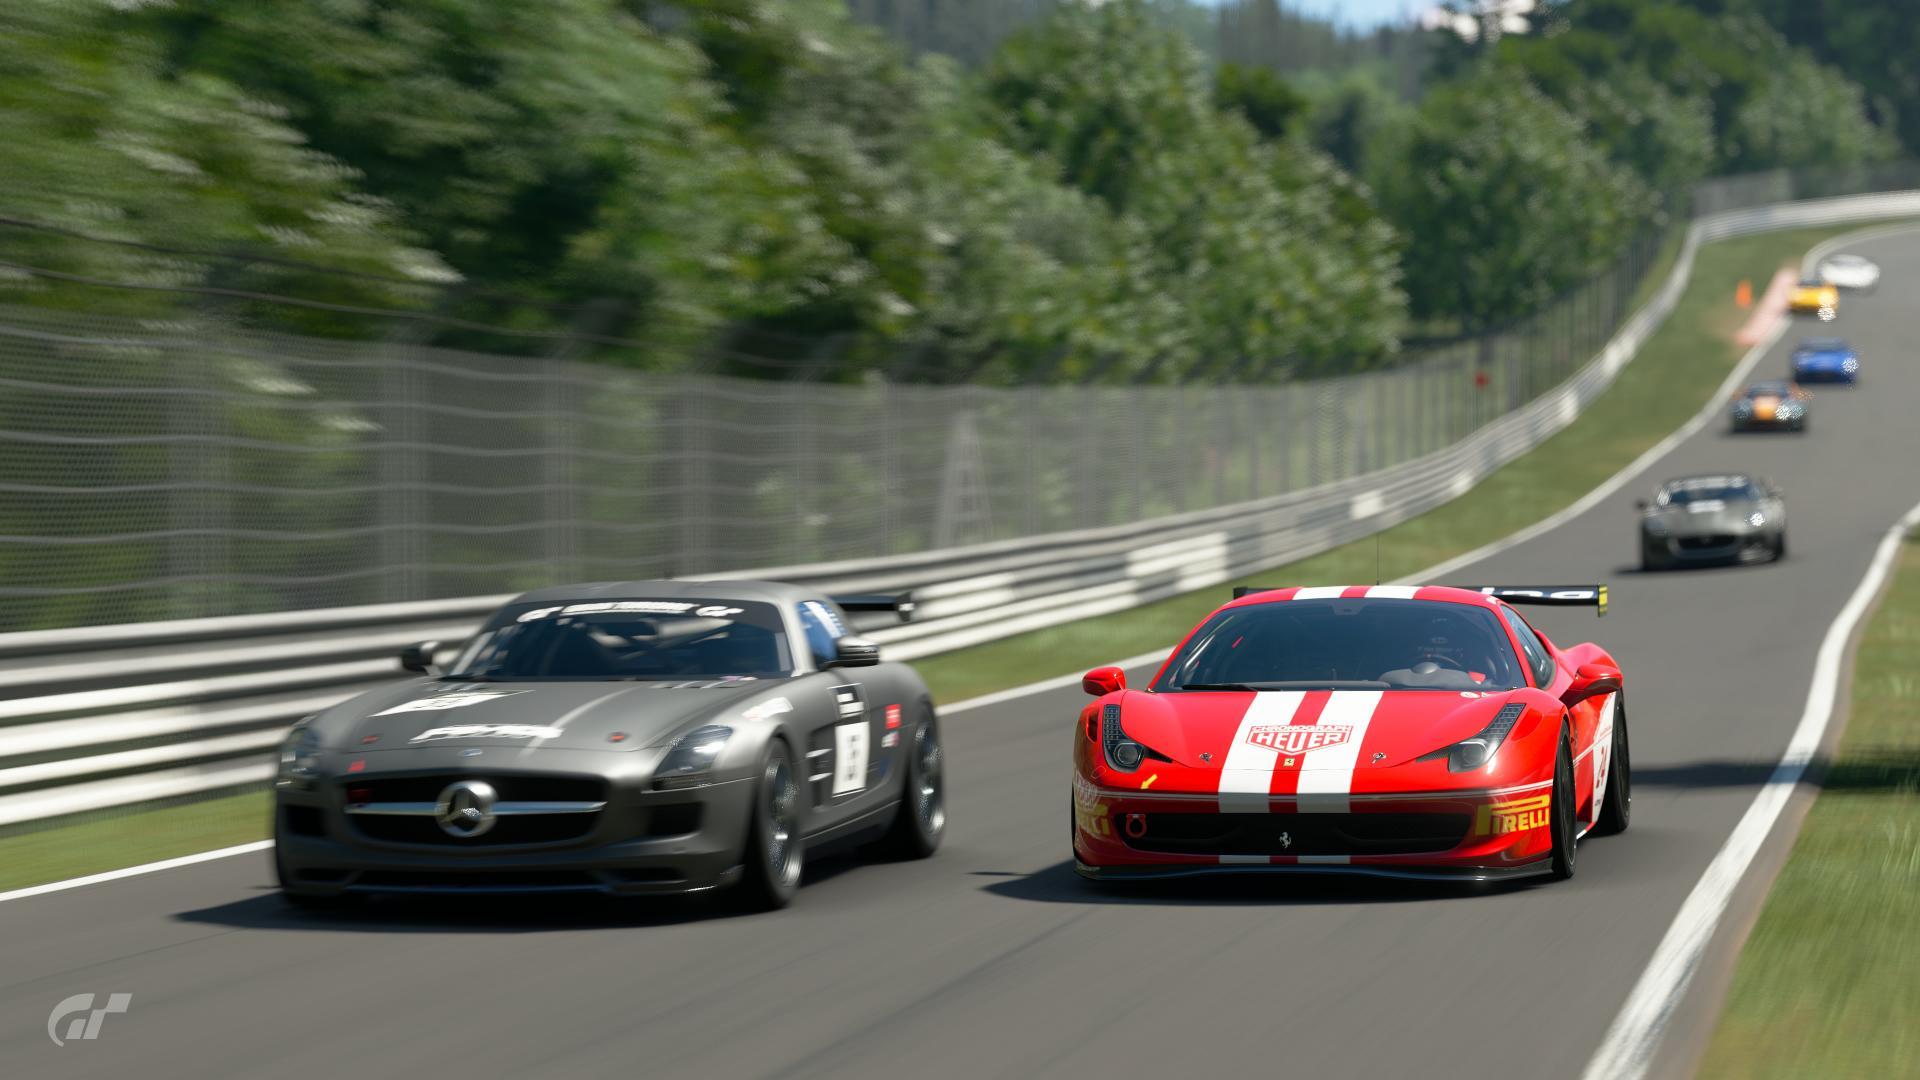 Ferrari Vs Mercedes Race Photos By Tahoeracing Community Gran Turismo Sport